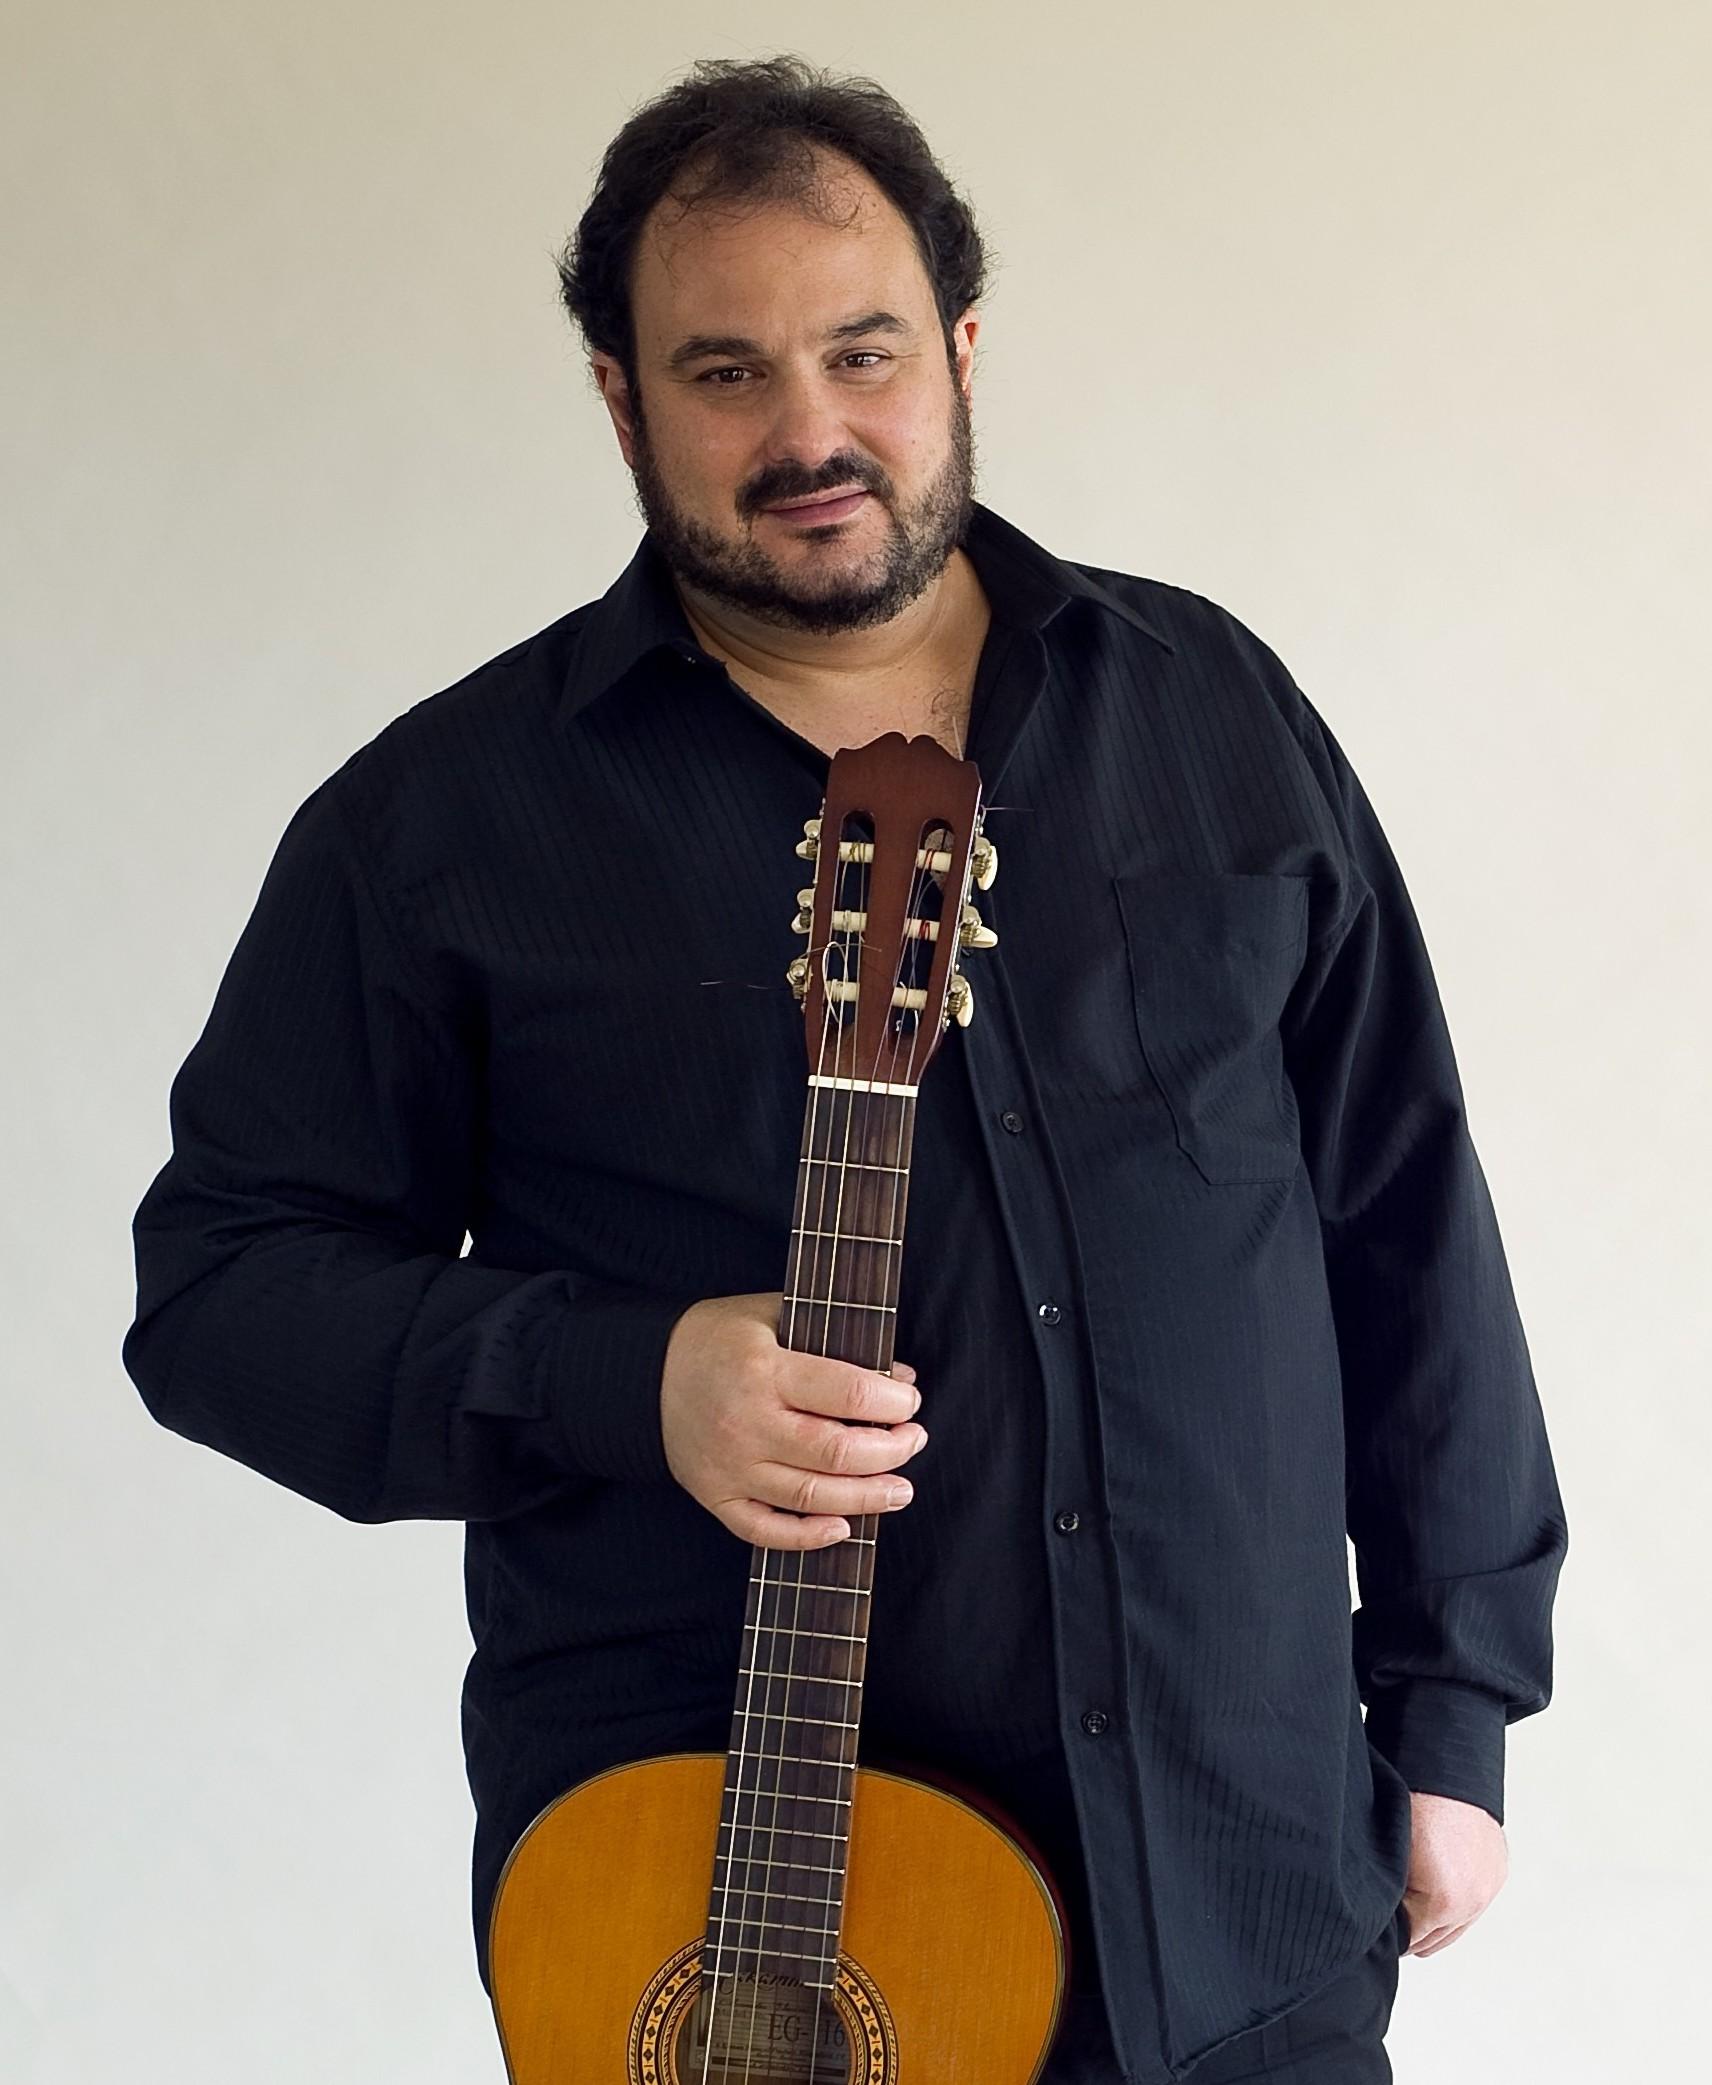 Pablo Mezzelani